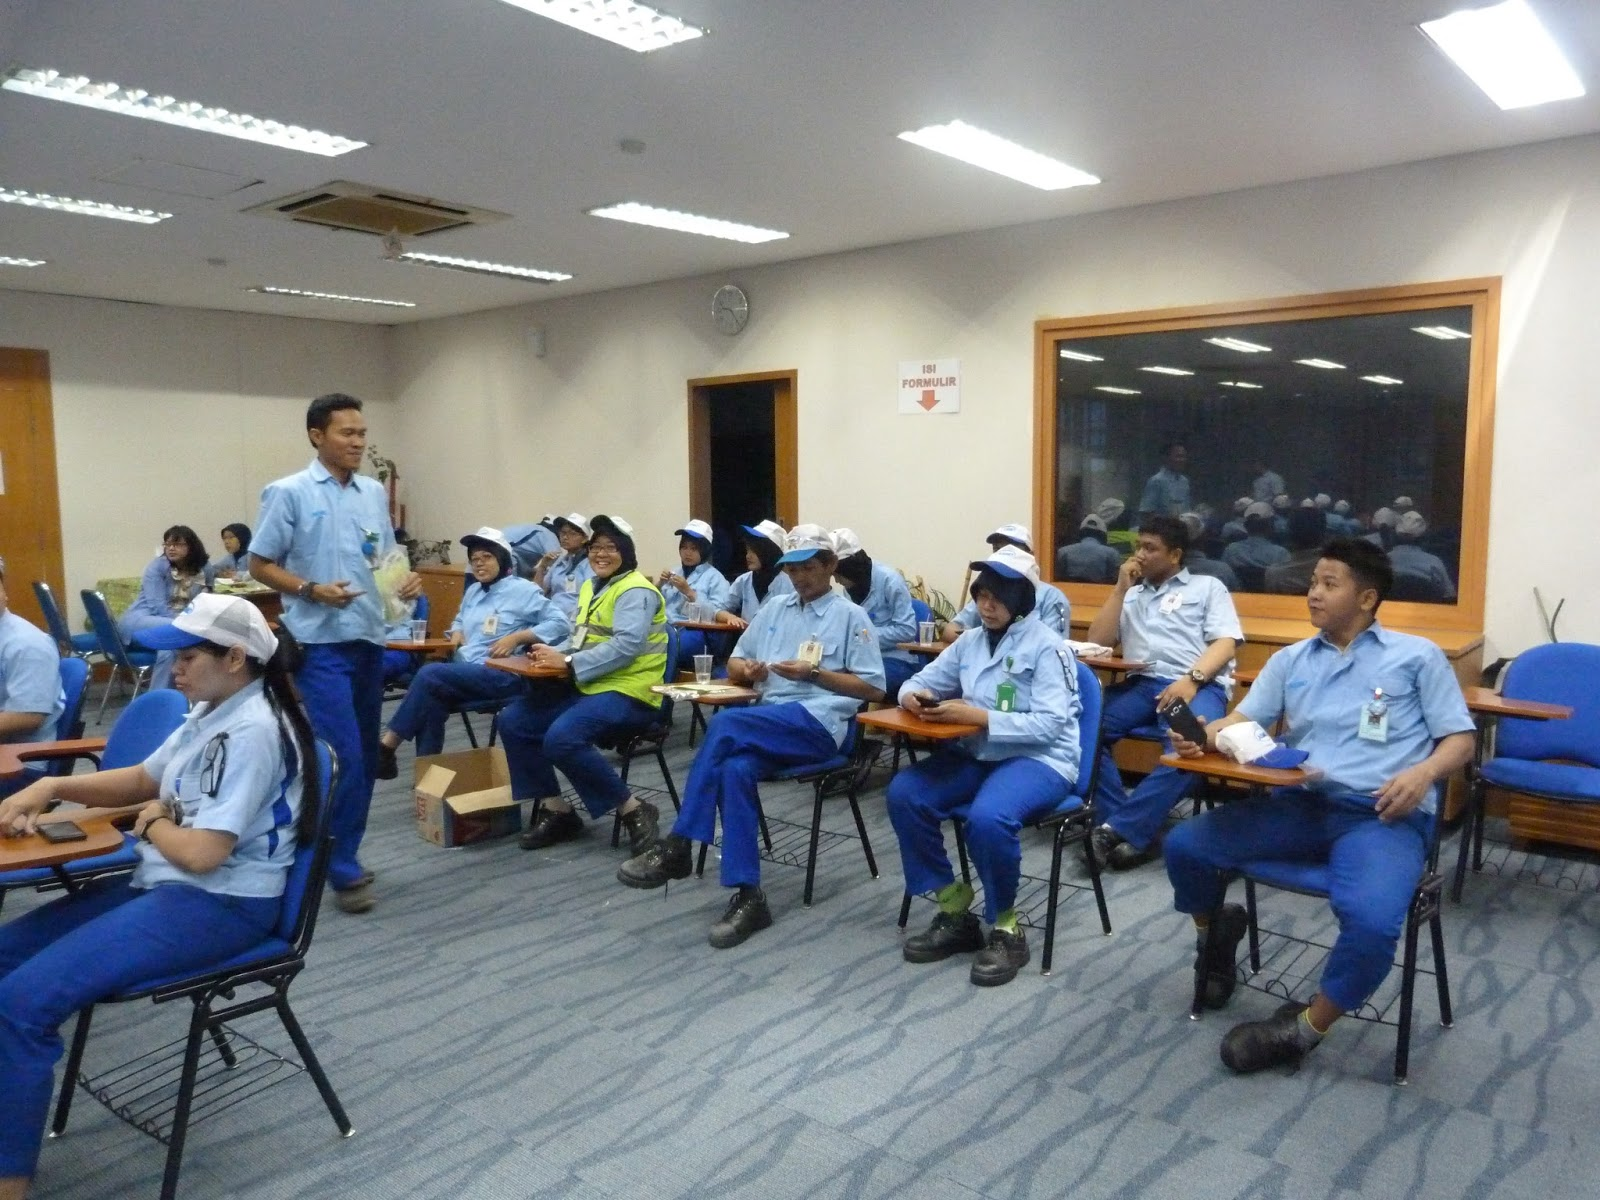 Loker Smk/Sma 2017 Kawasan MM2100 Bekasi PT. Polymatech Indonesia